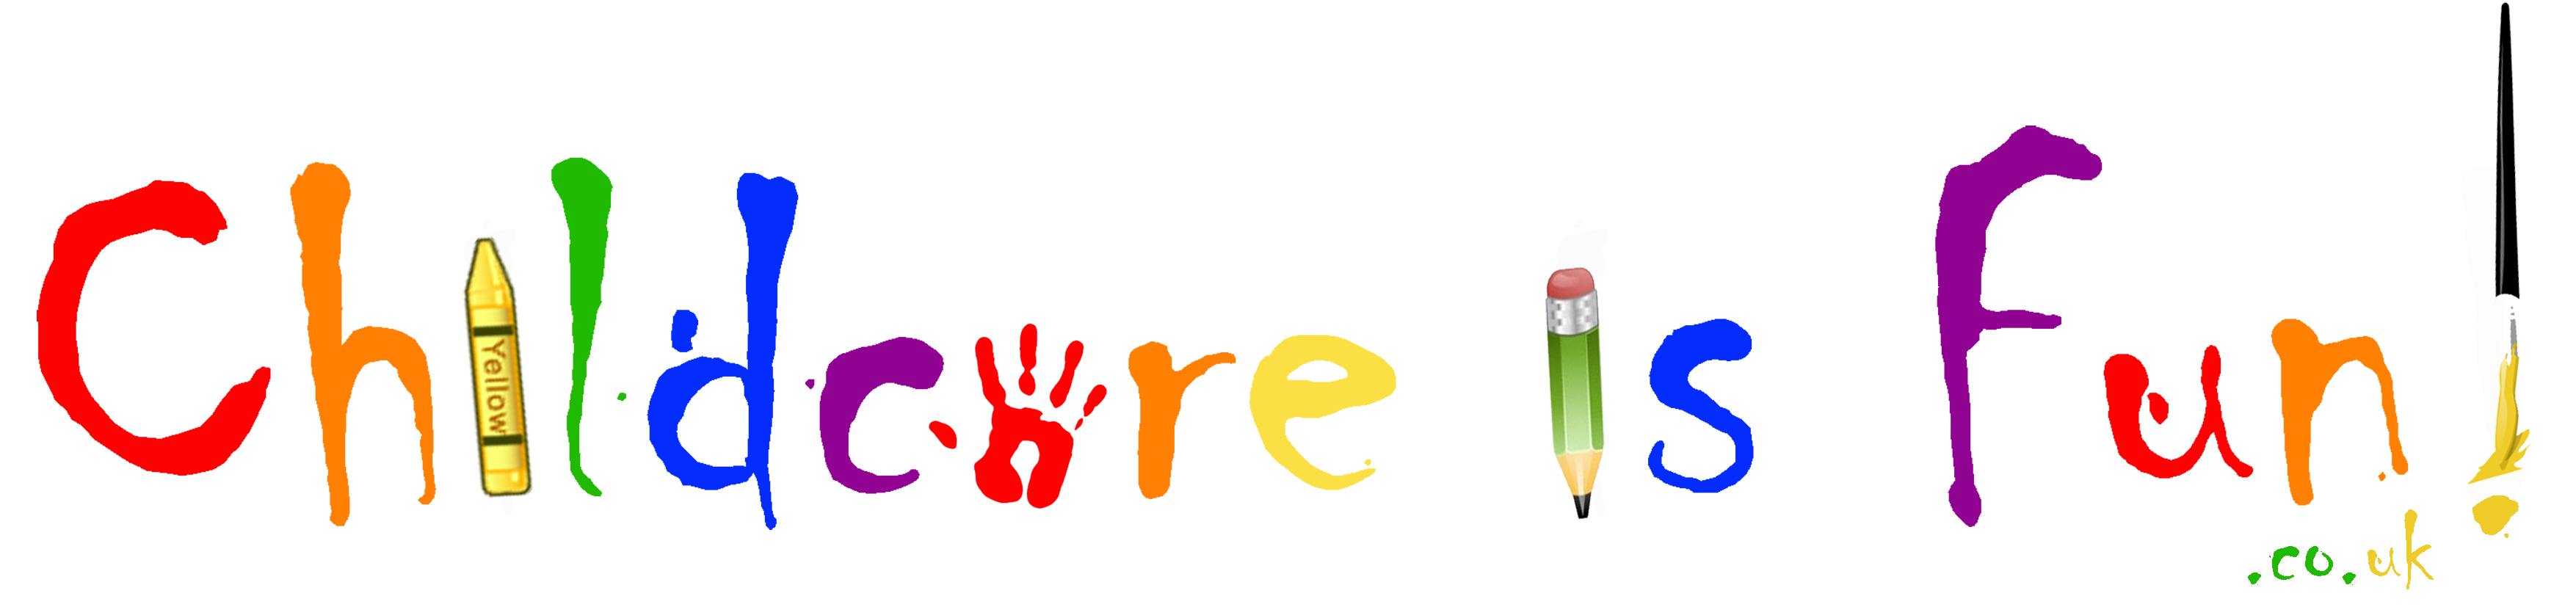 Childcare Clipart